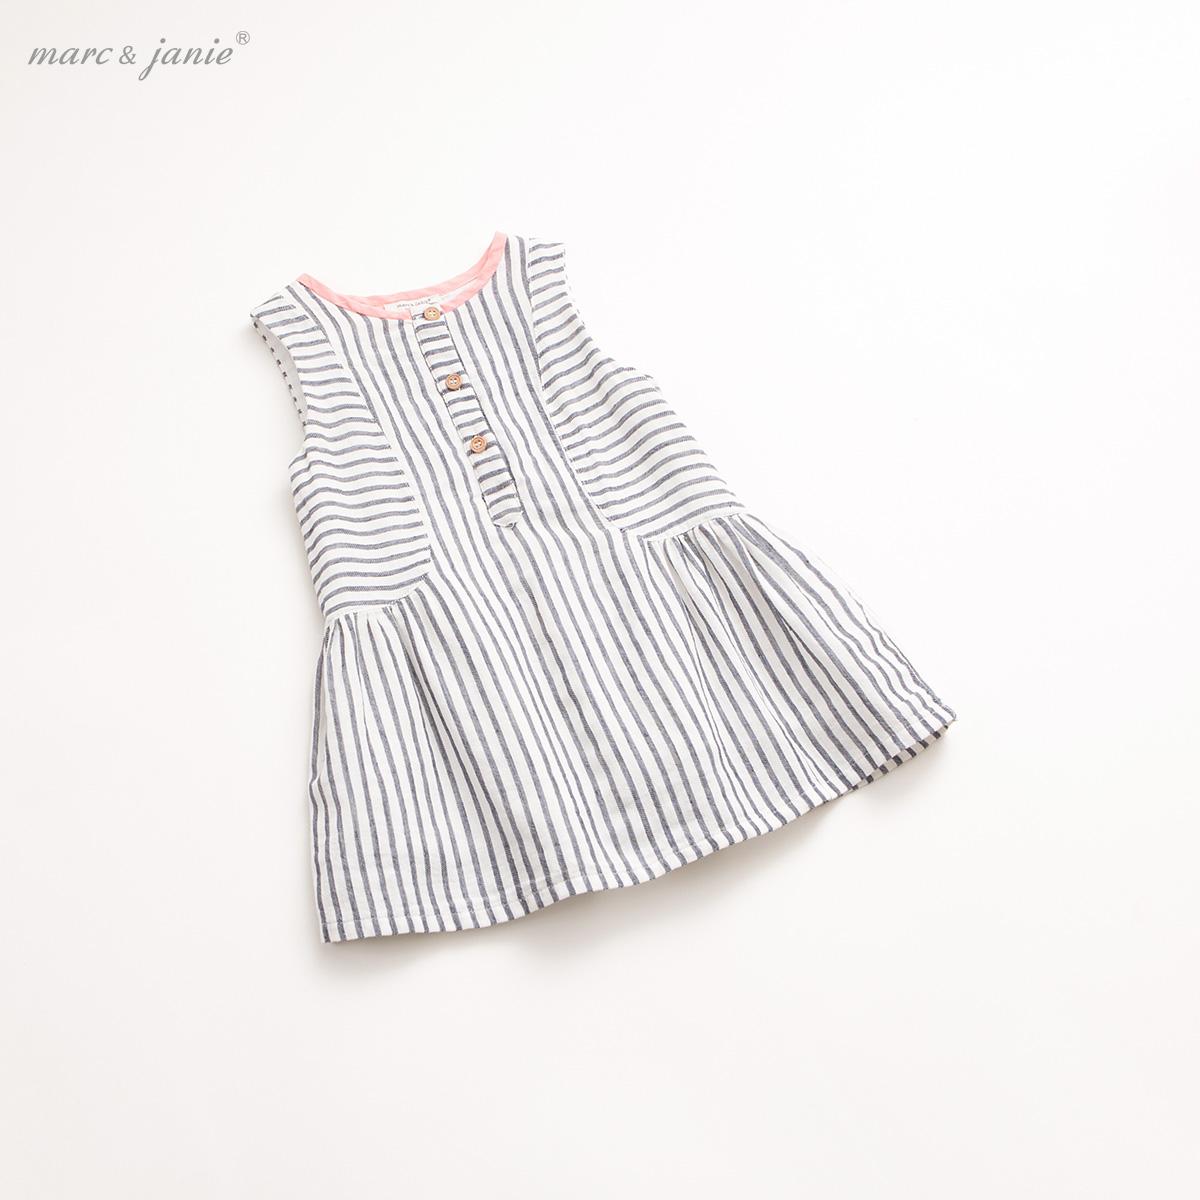 marc janie馬克珍妮夏裝新品寶寶連衣裙 女童兒童棉麻裙子16098